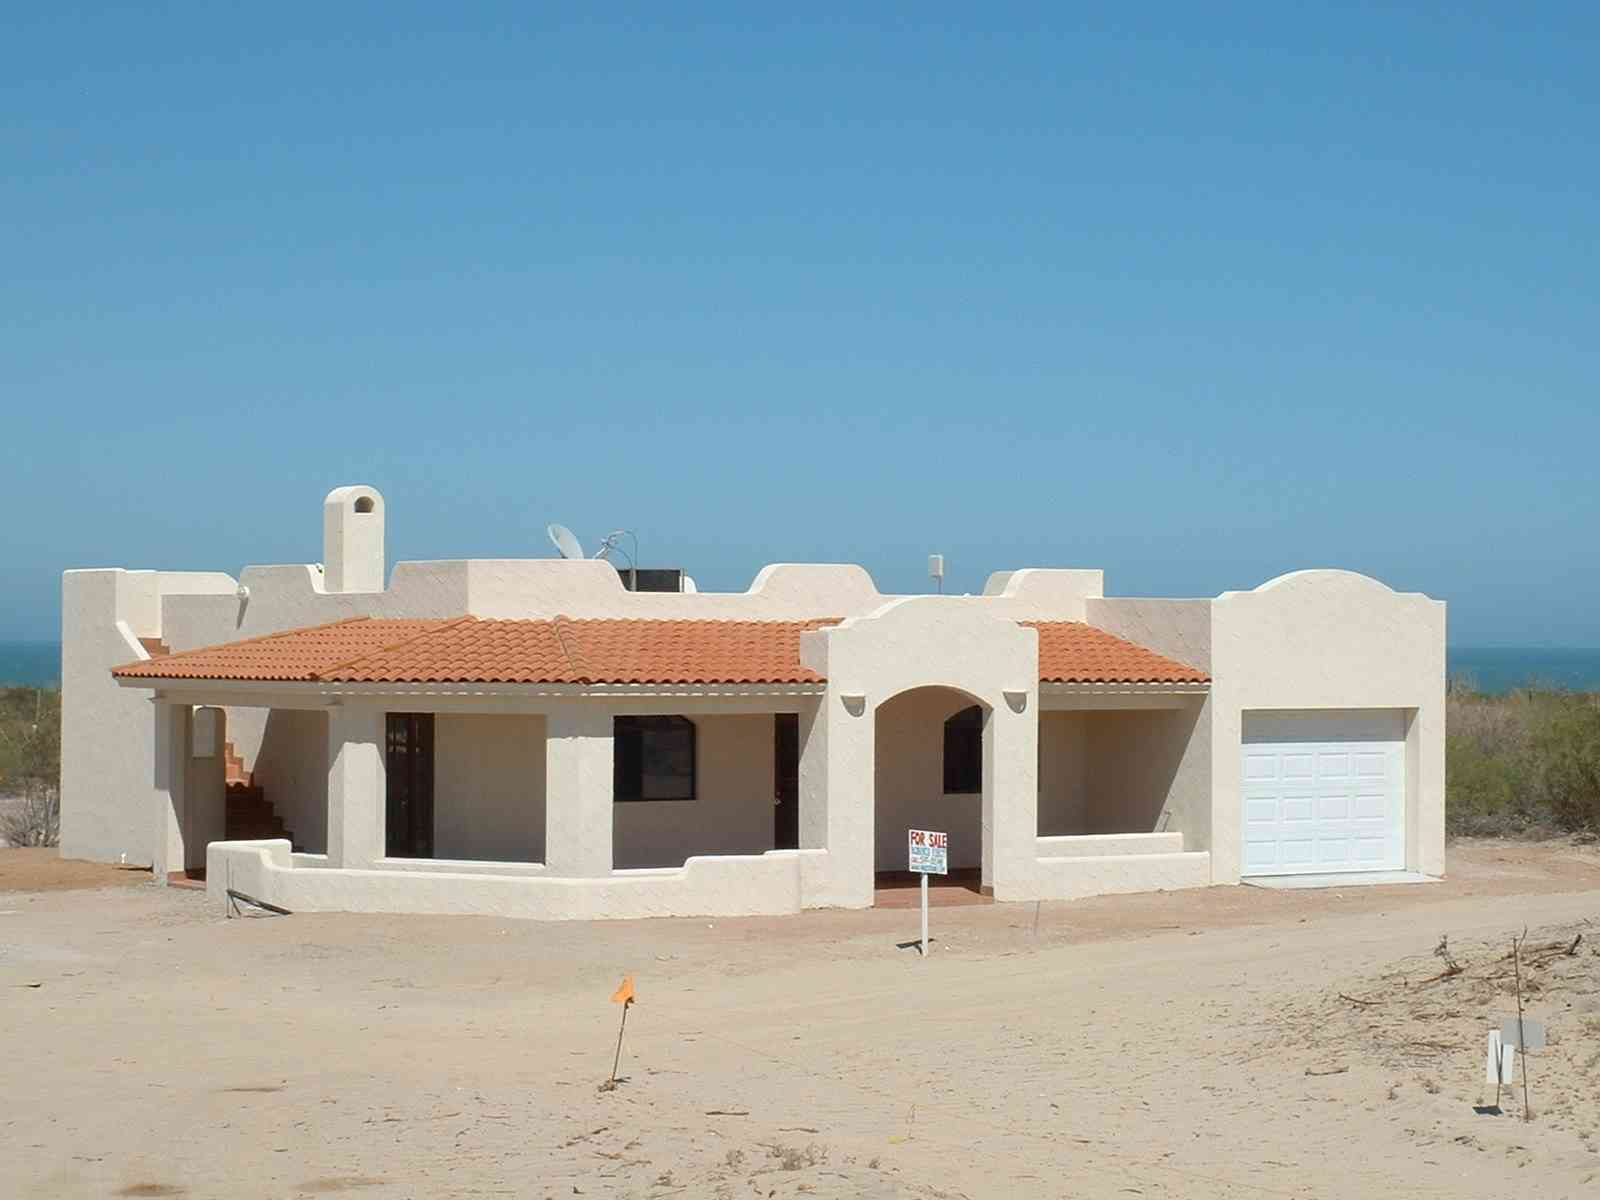 San Felipe Baja Mexico Real Estate For Sale Playa De Oro